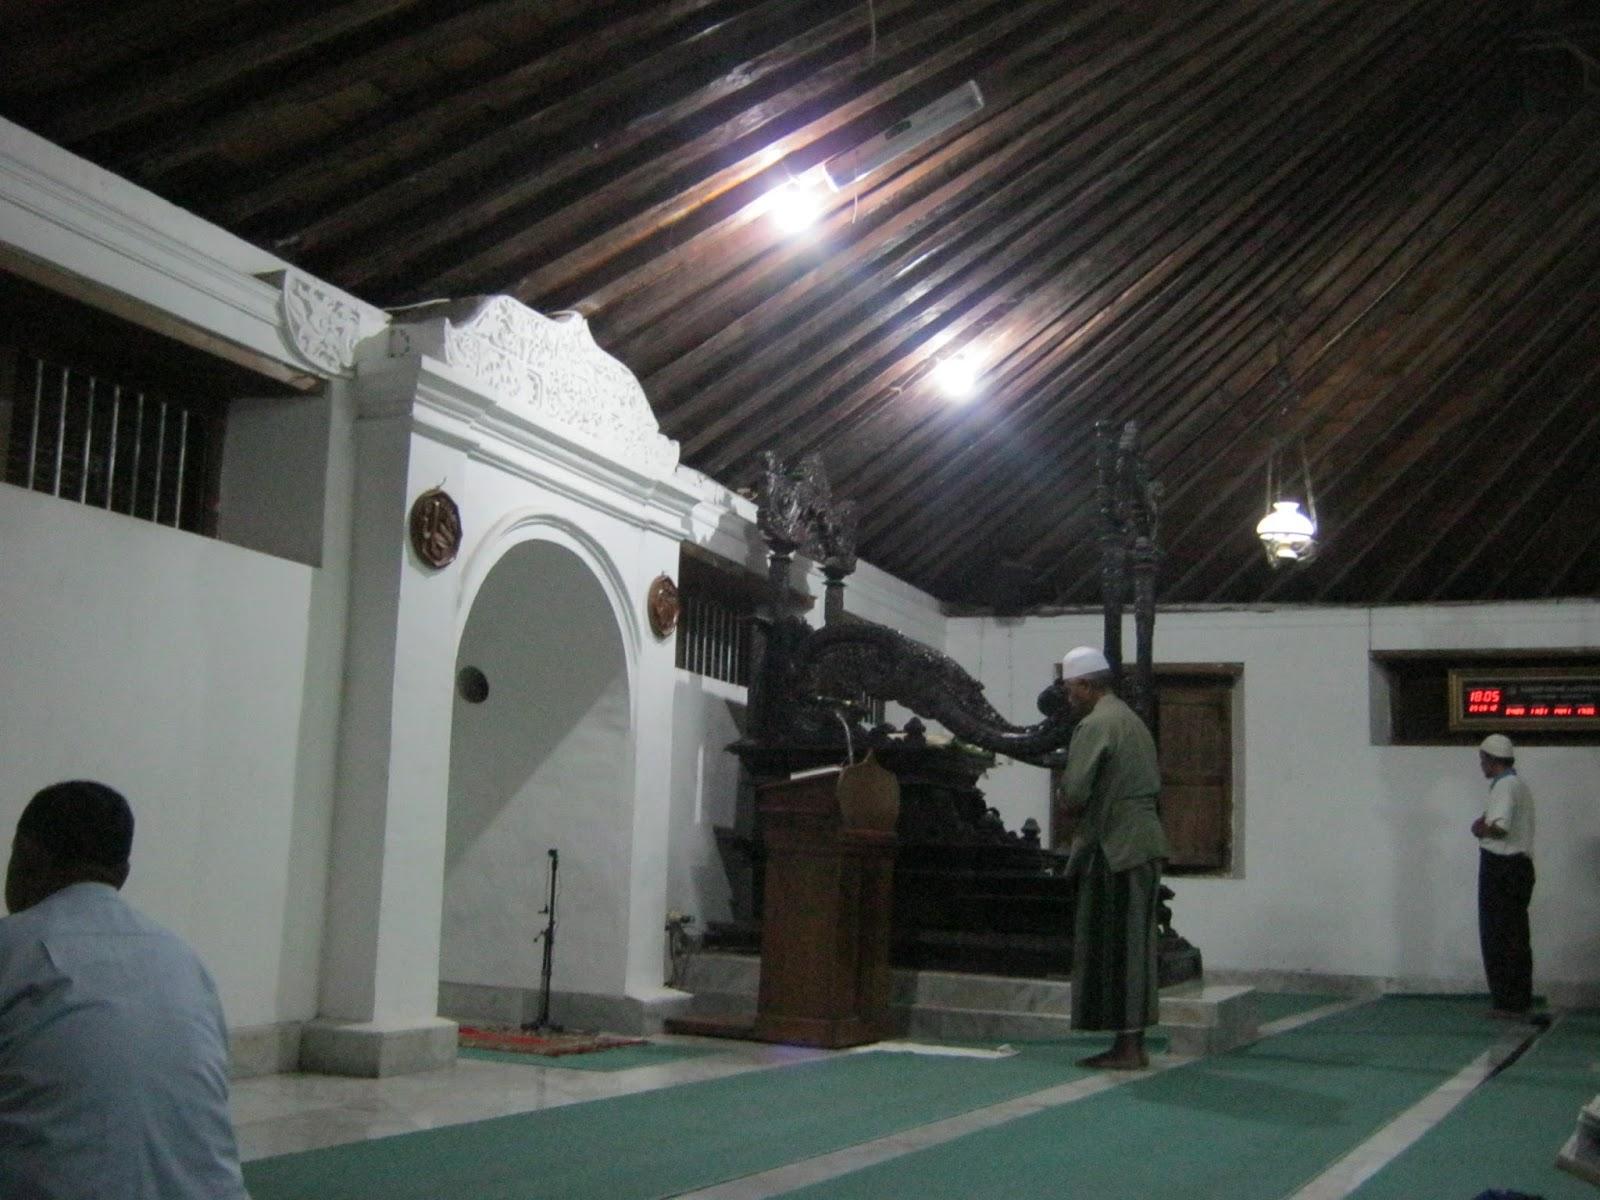 Jelajah Masjid Besar Mataram Kotagede Jogjakarta Adem Rasanya Duduk Tua